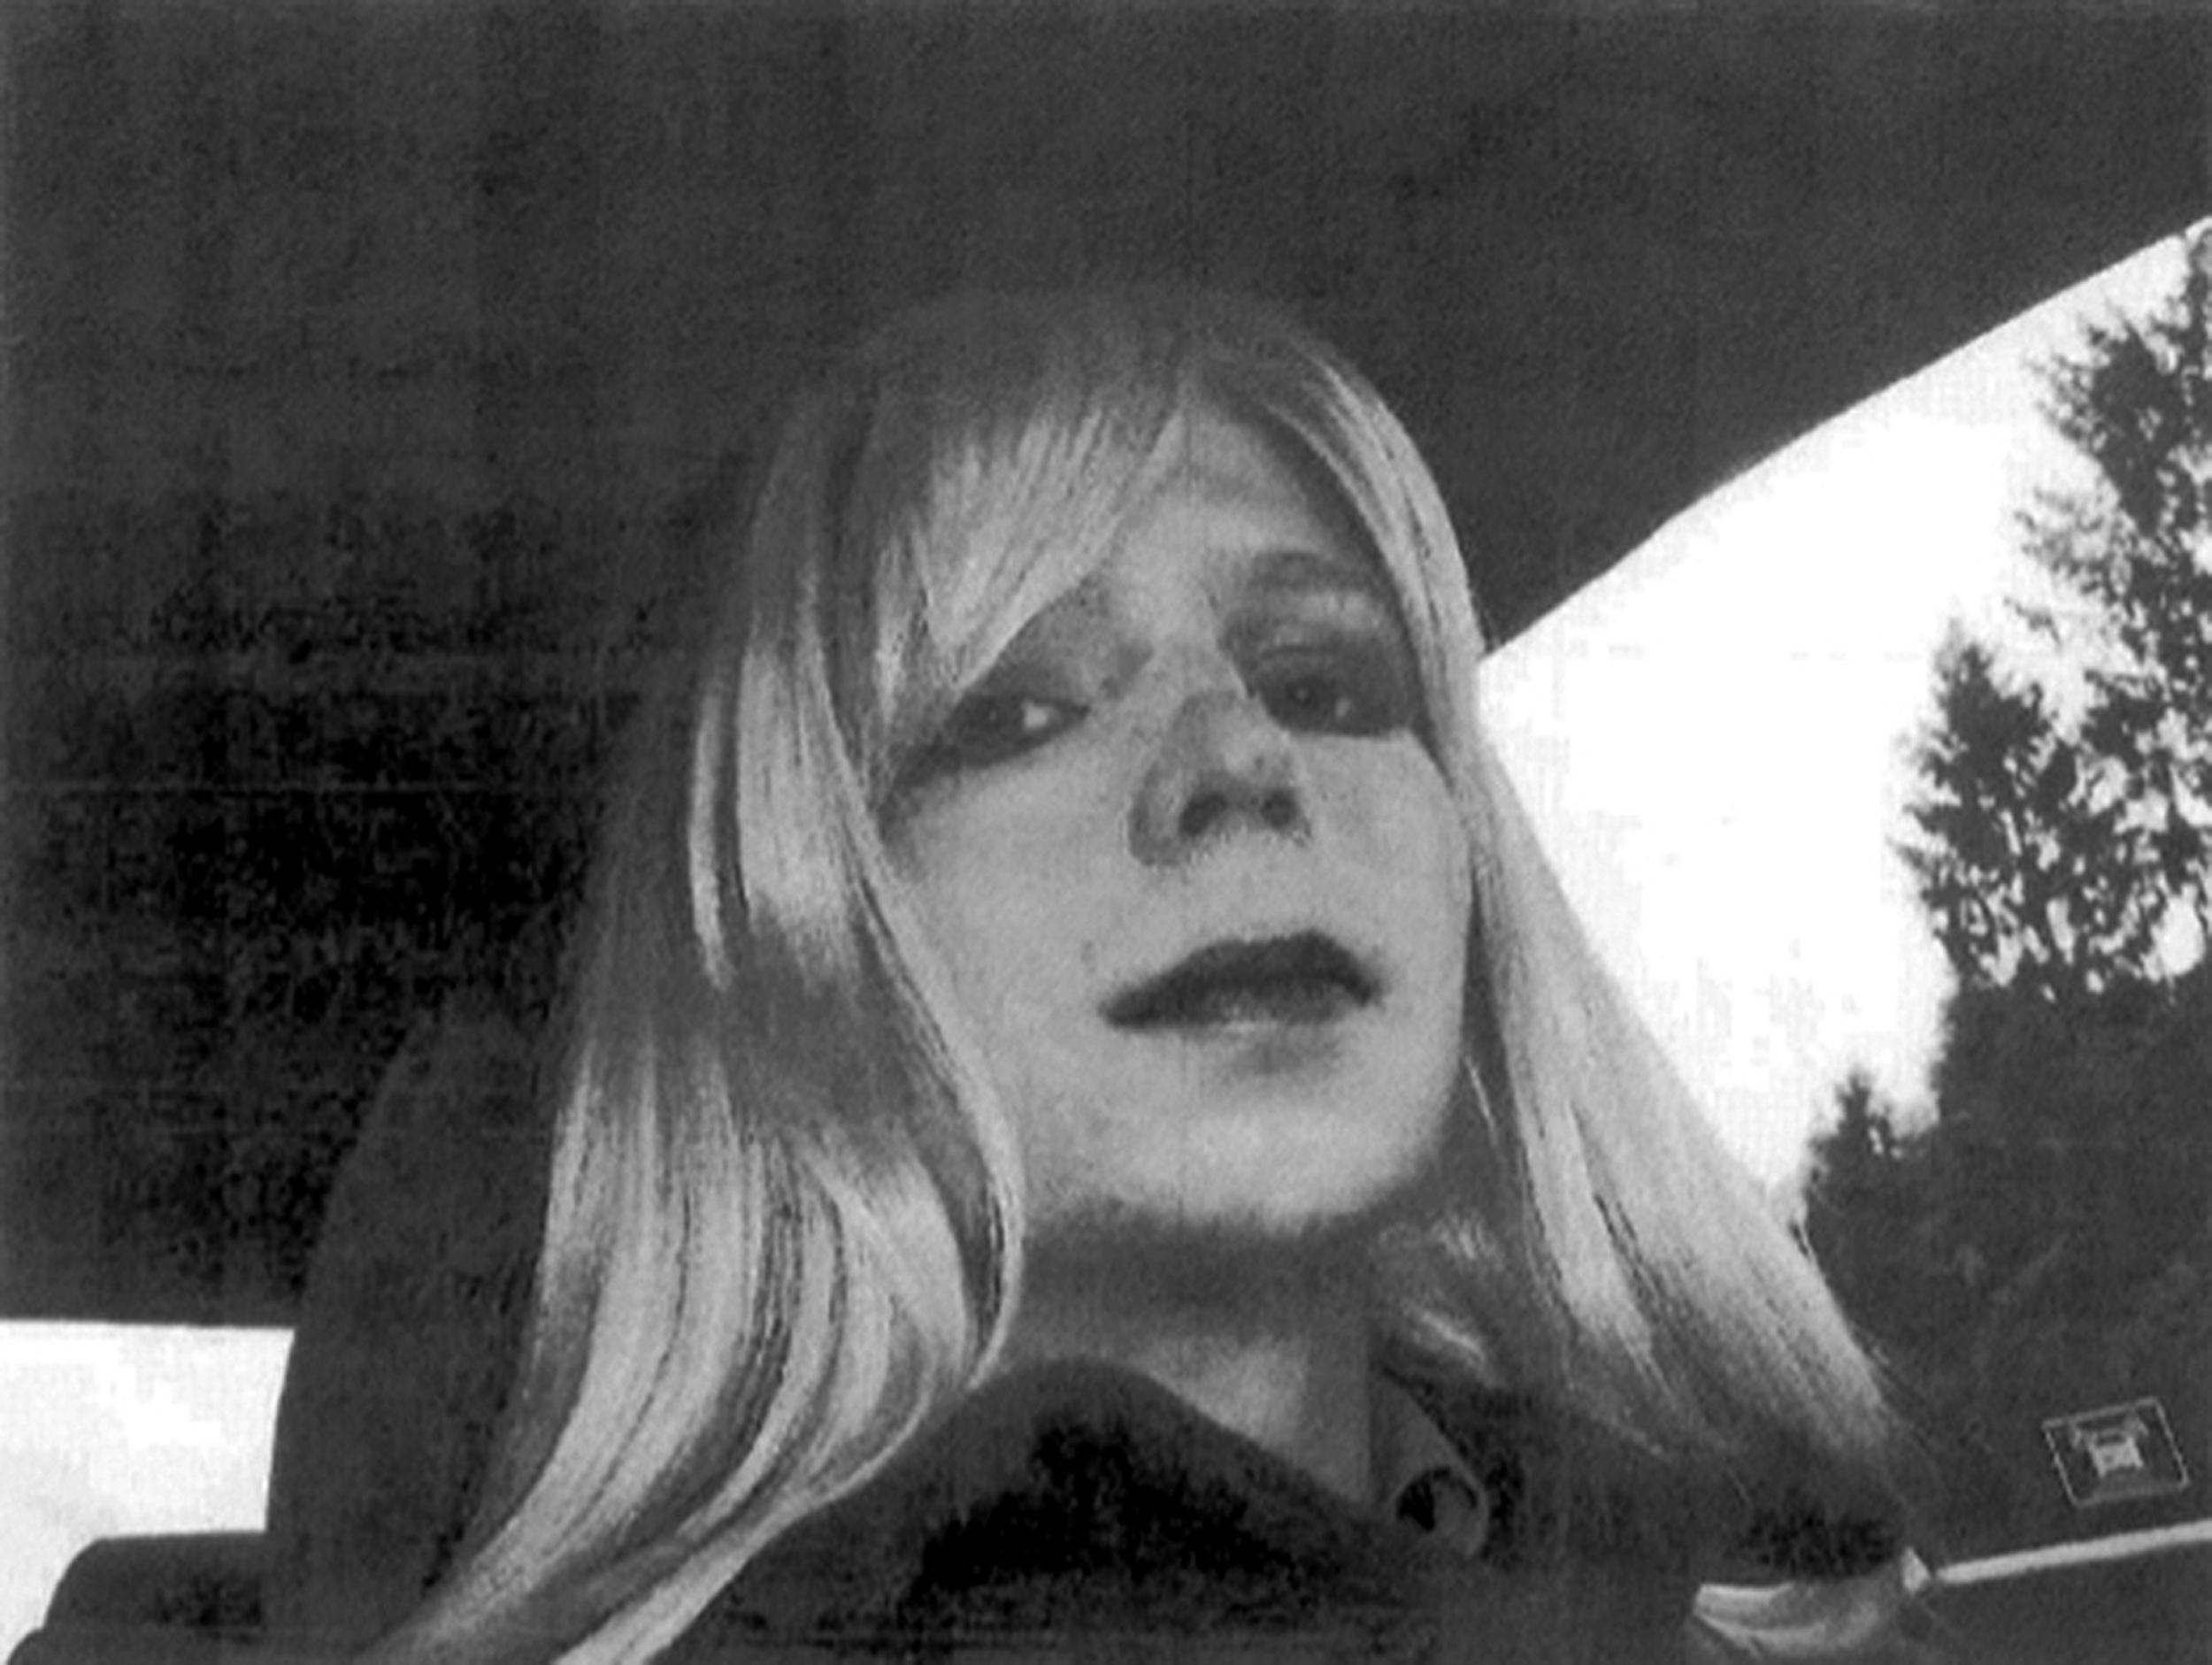 Image: Bradley Manning in wig and make-up.